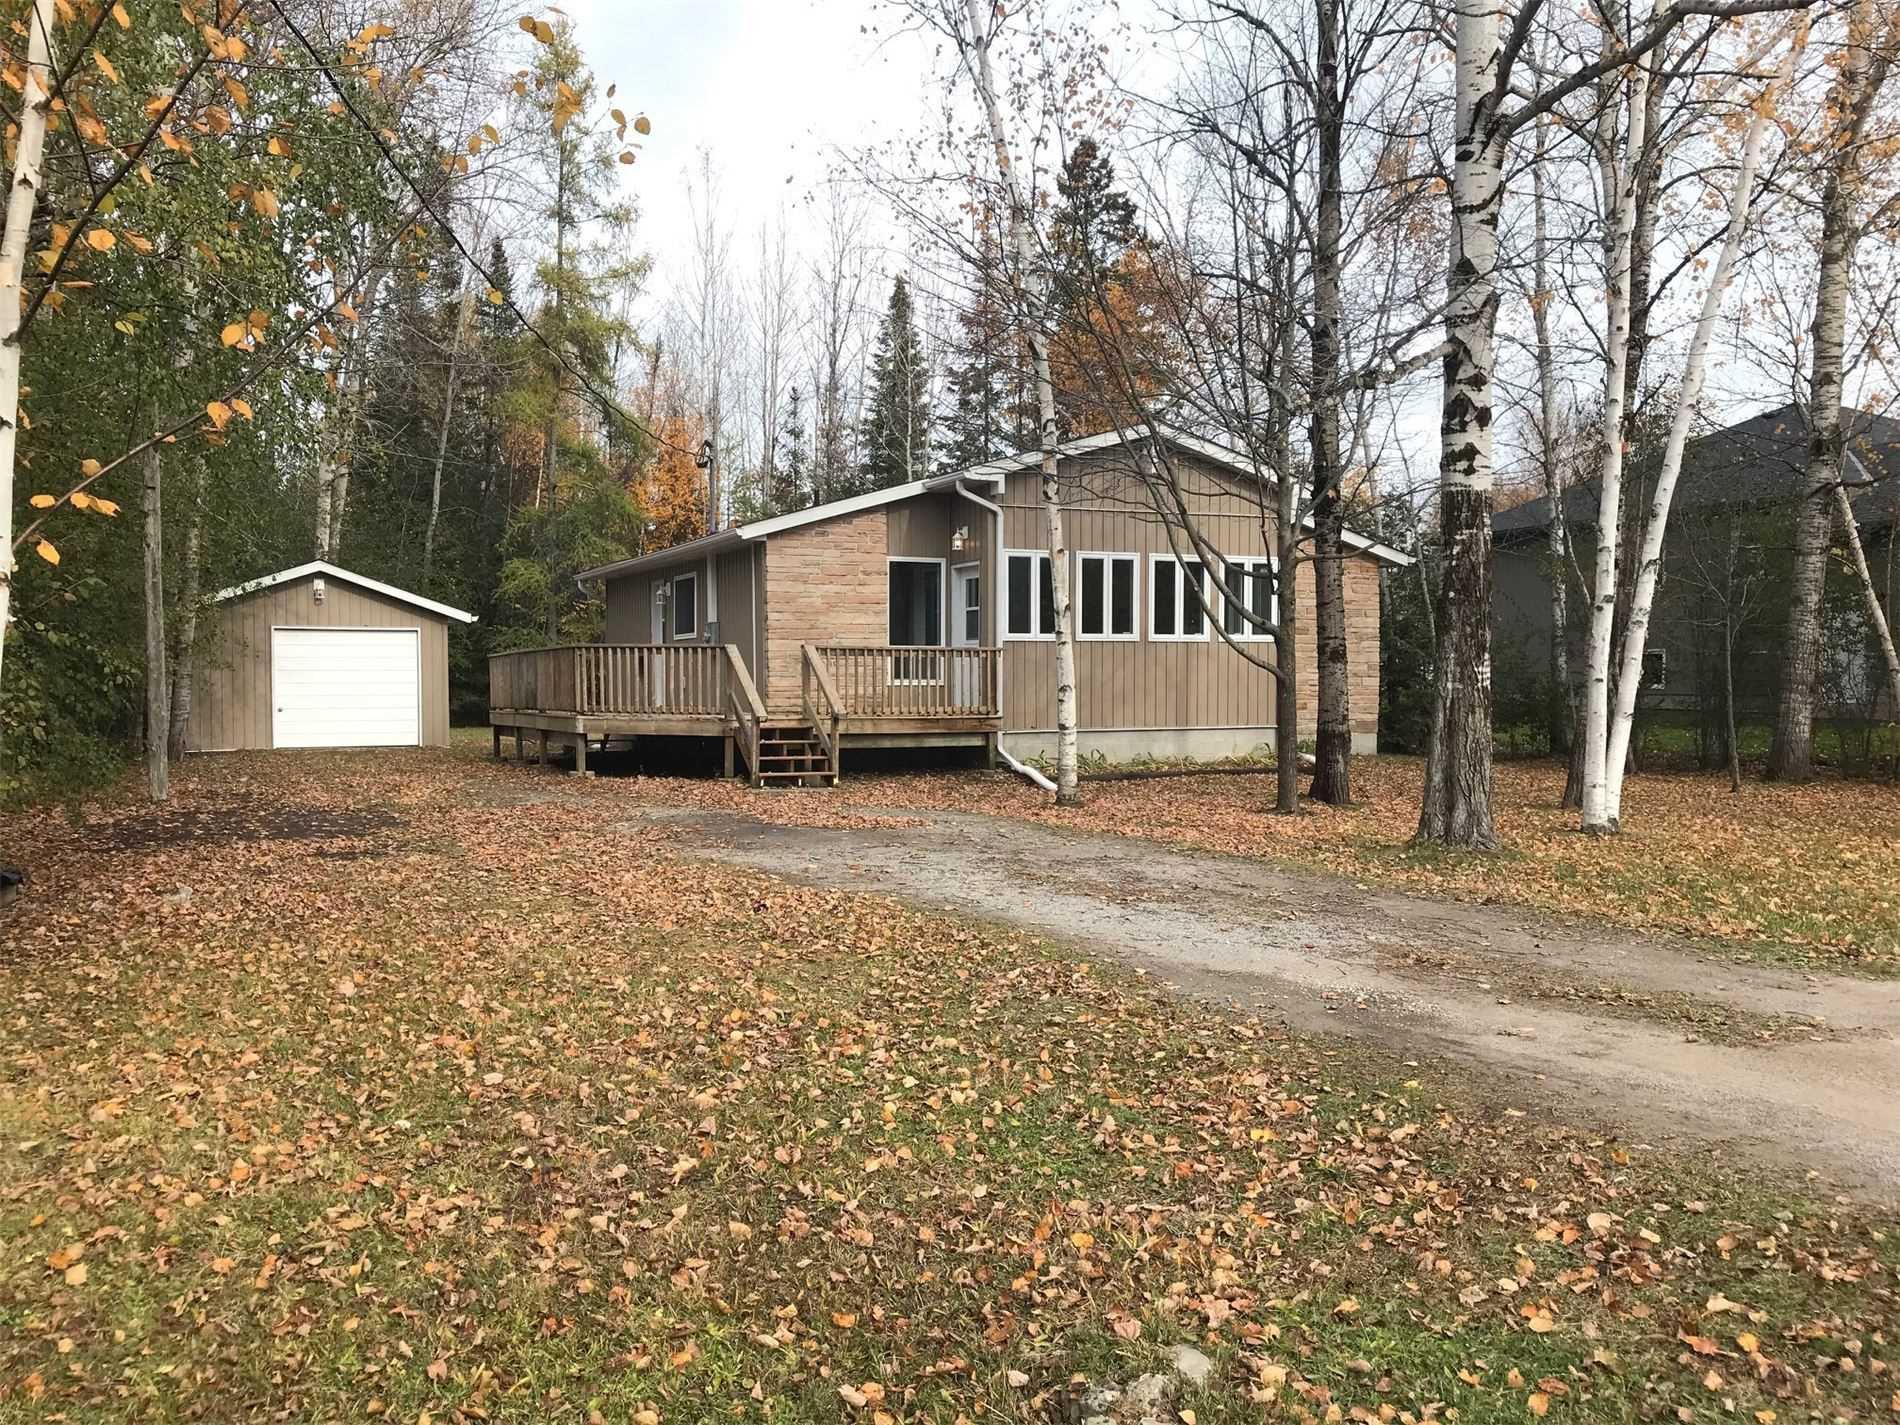 Main Photo: 7 Pinewood Boulevard in Kawartha Lakes: Rural Eldon House (Bungalow) for sale : MLS®# X4625351